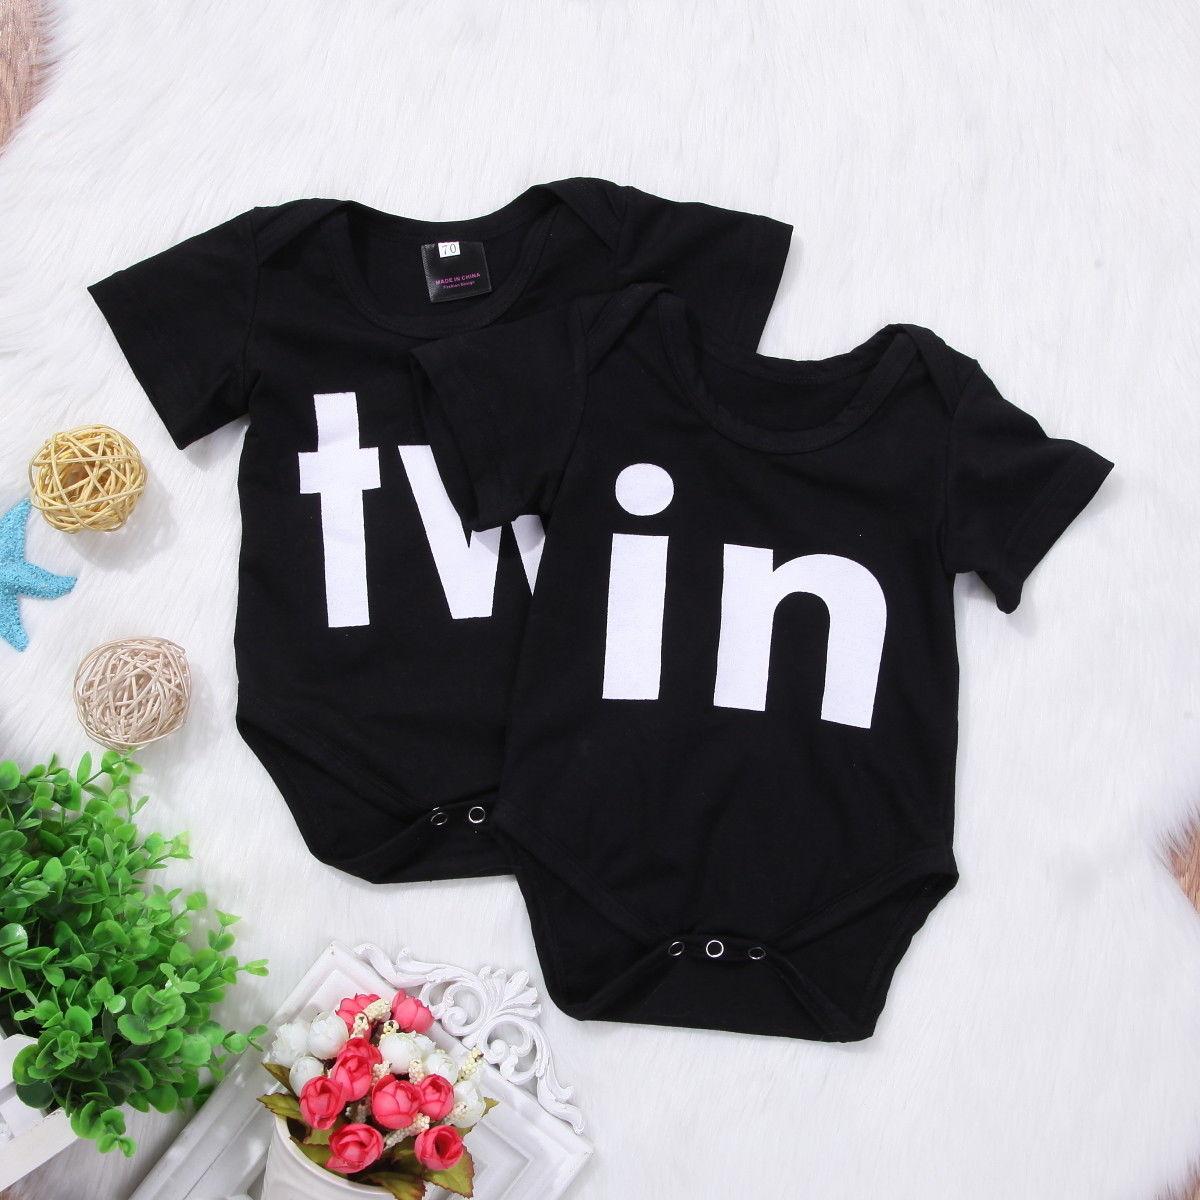 010109f67a8c 2018 new lovely kid black bodysuit Newborn Infant Baby Boys Girls ...